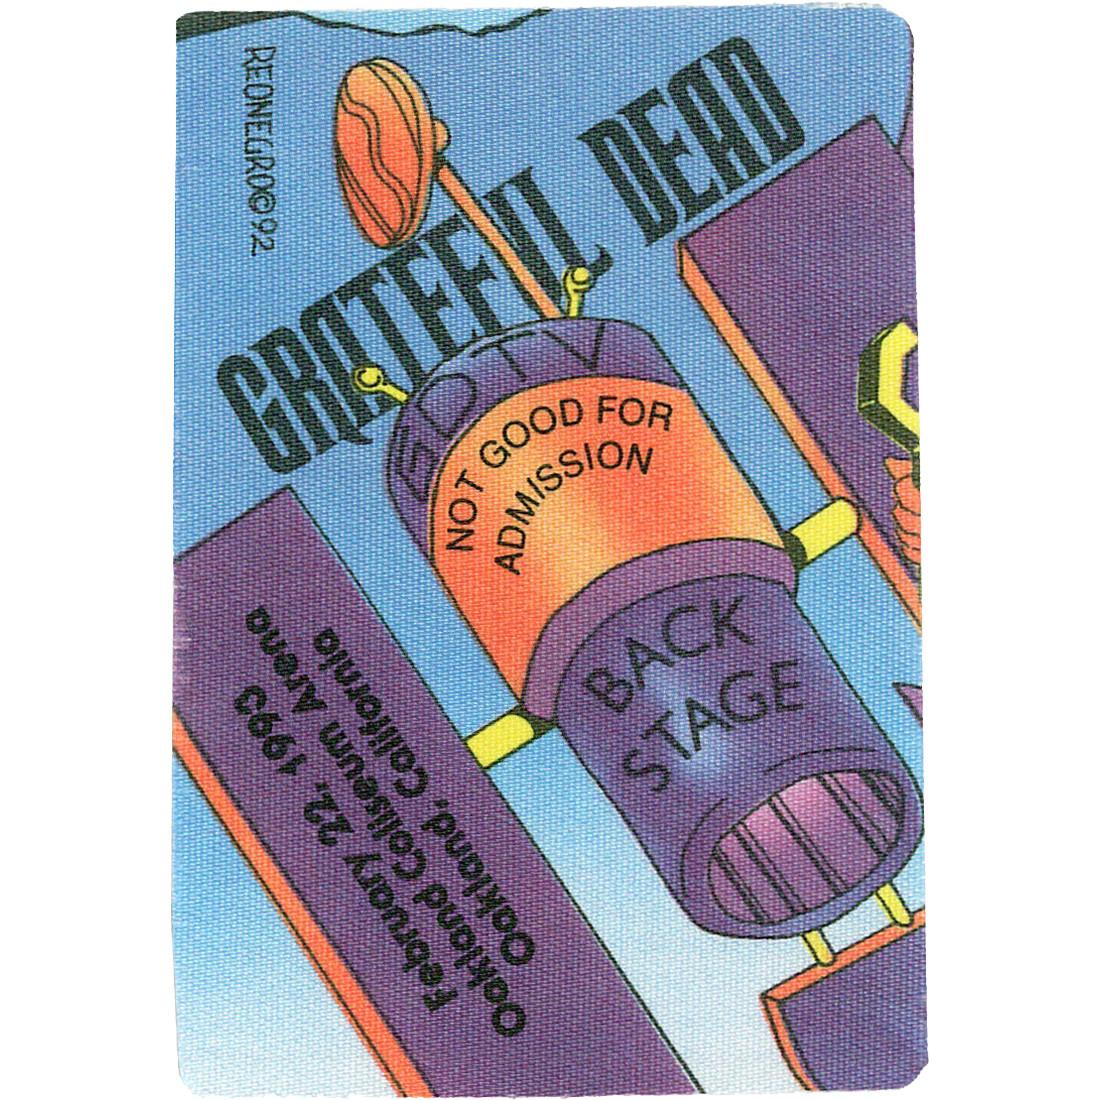 Grateful Dead 1993 02-22 Backstage Pass